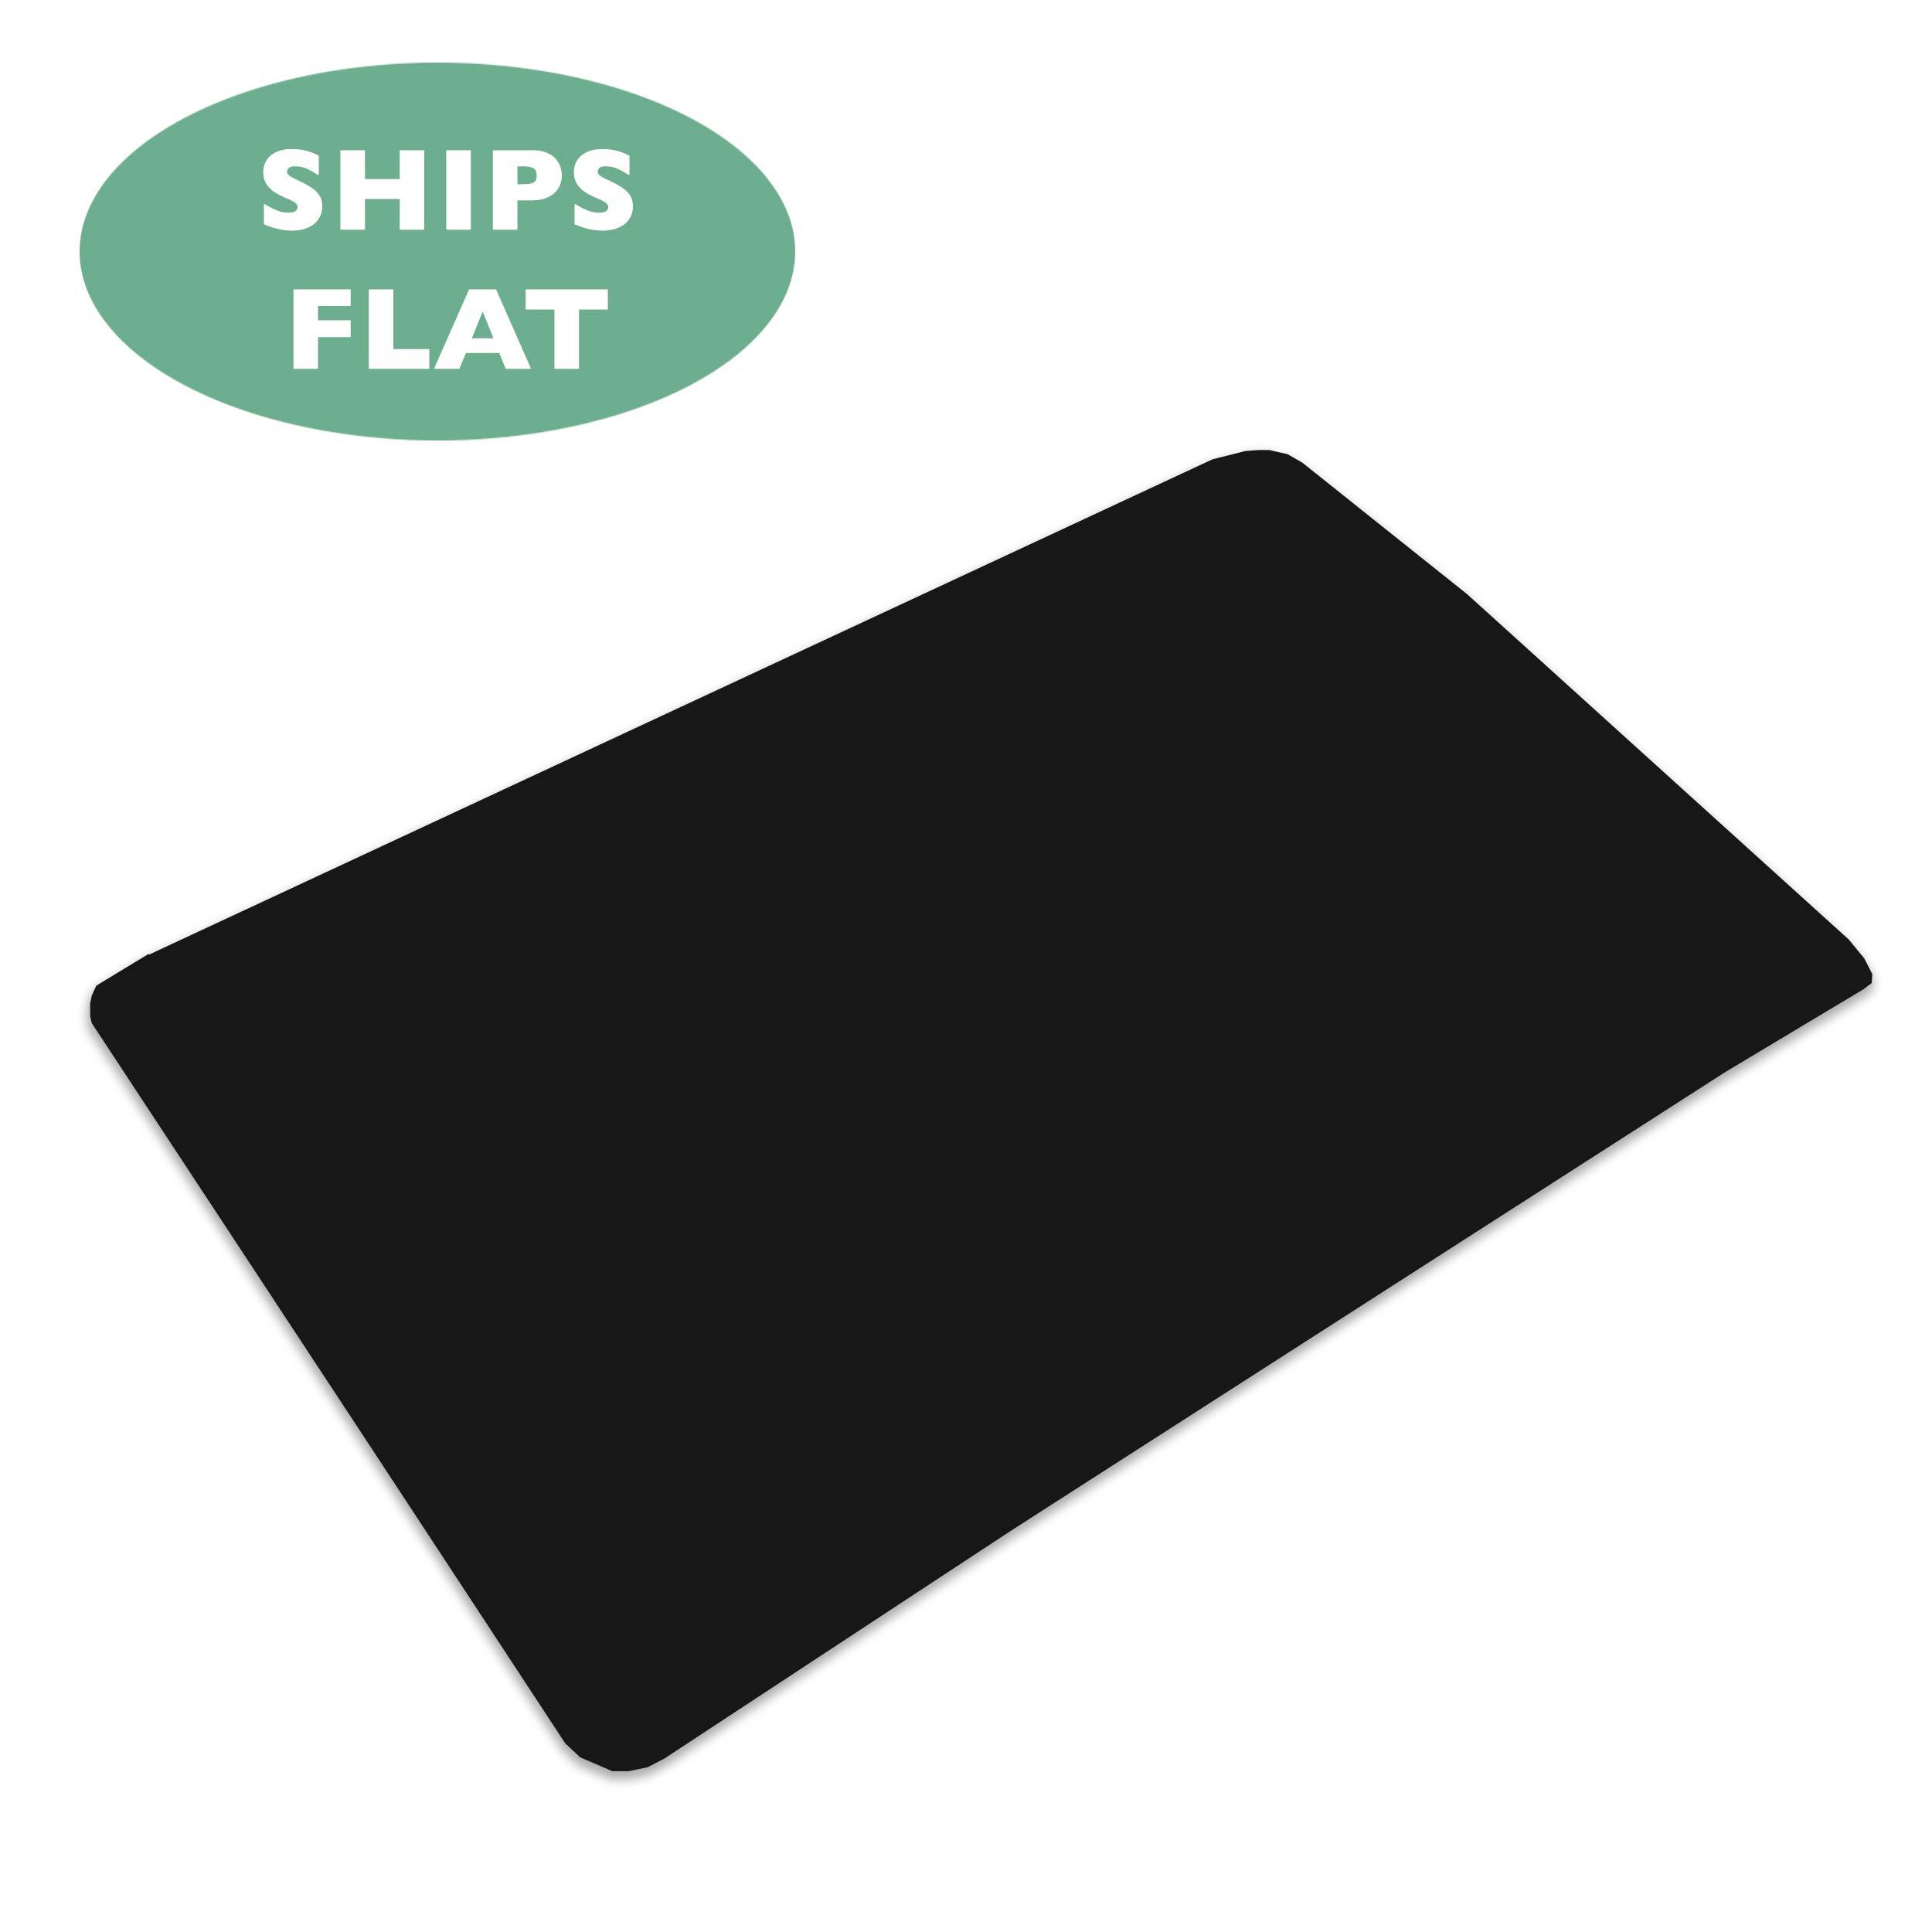 Office Chair Mat for Hard Floors 36 x 48 - Black Hardwood Mat for Desk Chairs - Ships Flat